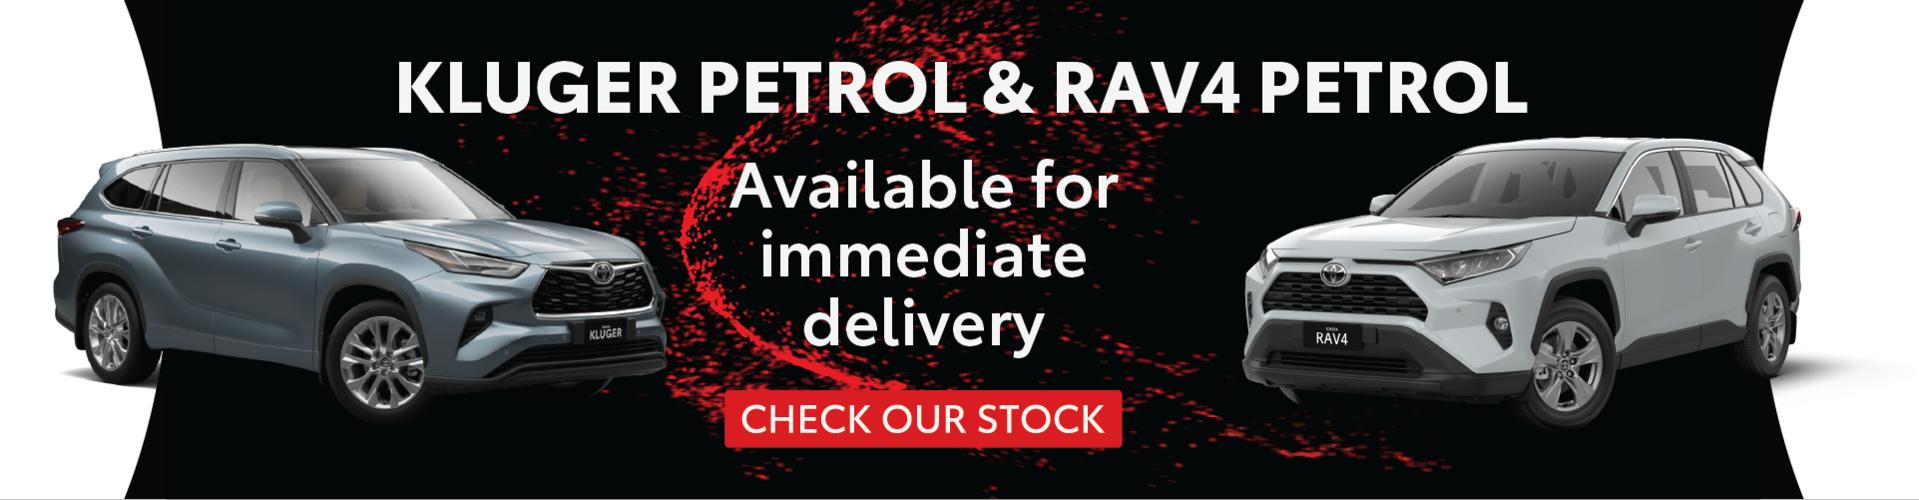 RAV4 Petrol & Kluger Petrol in stock at Ken Mills Toyota